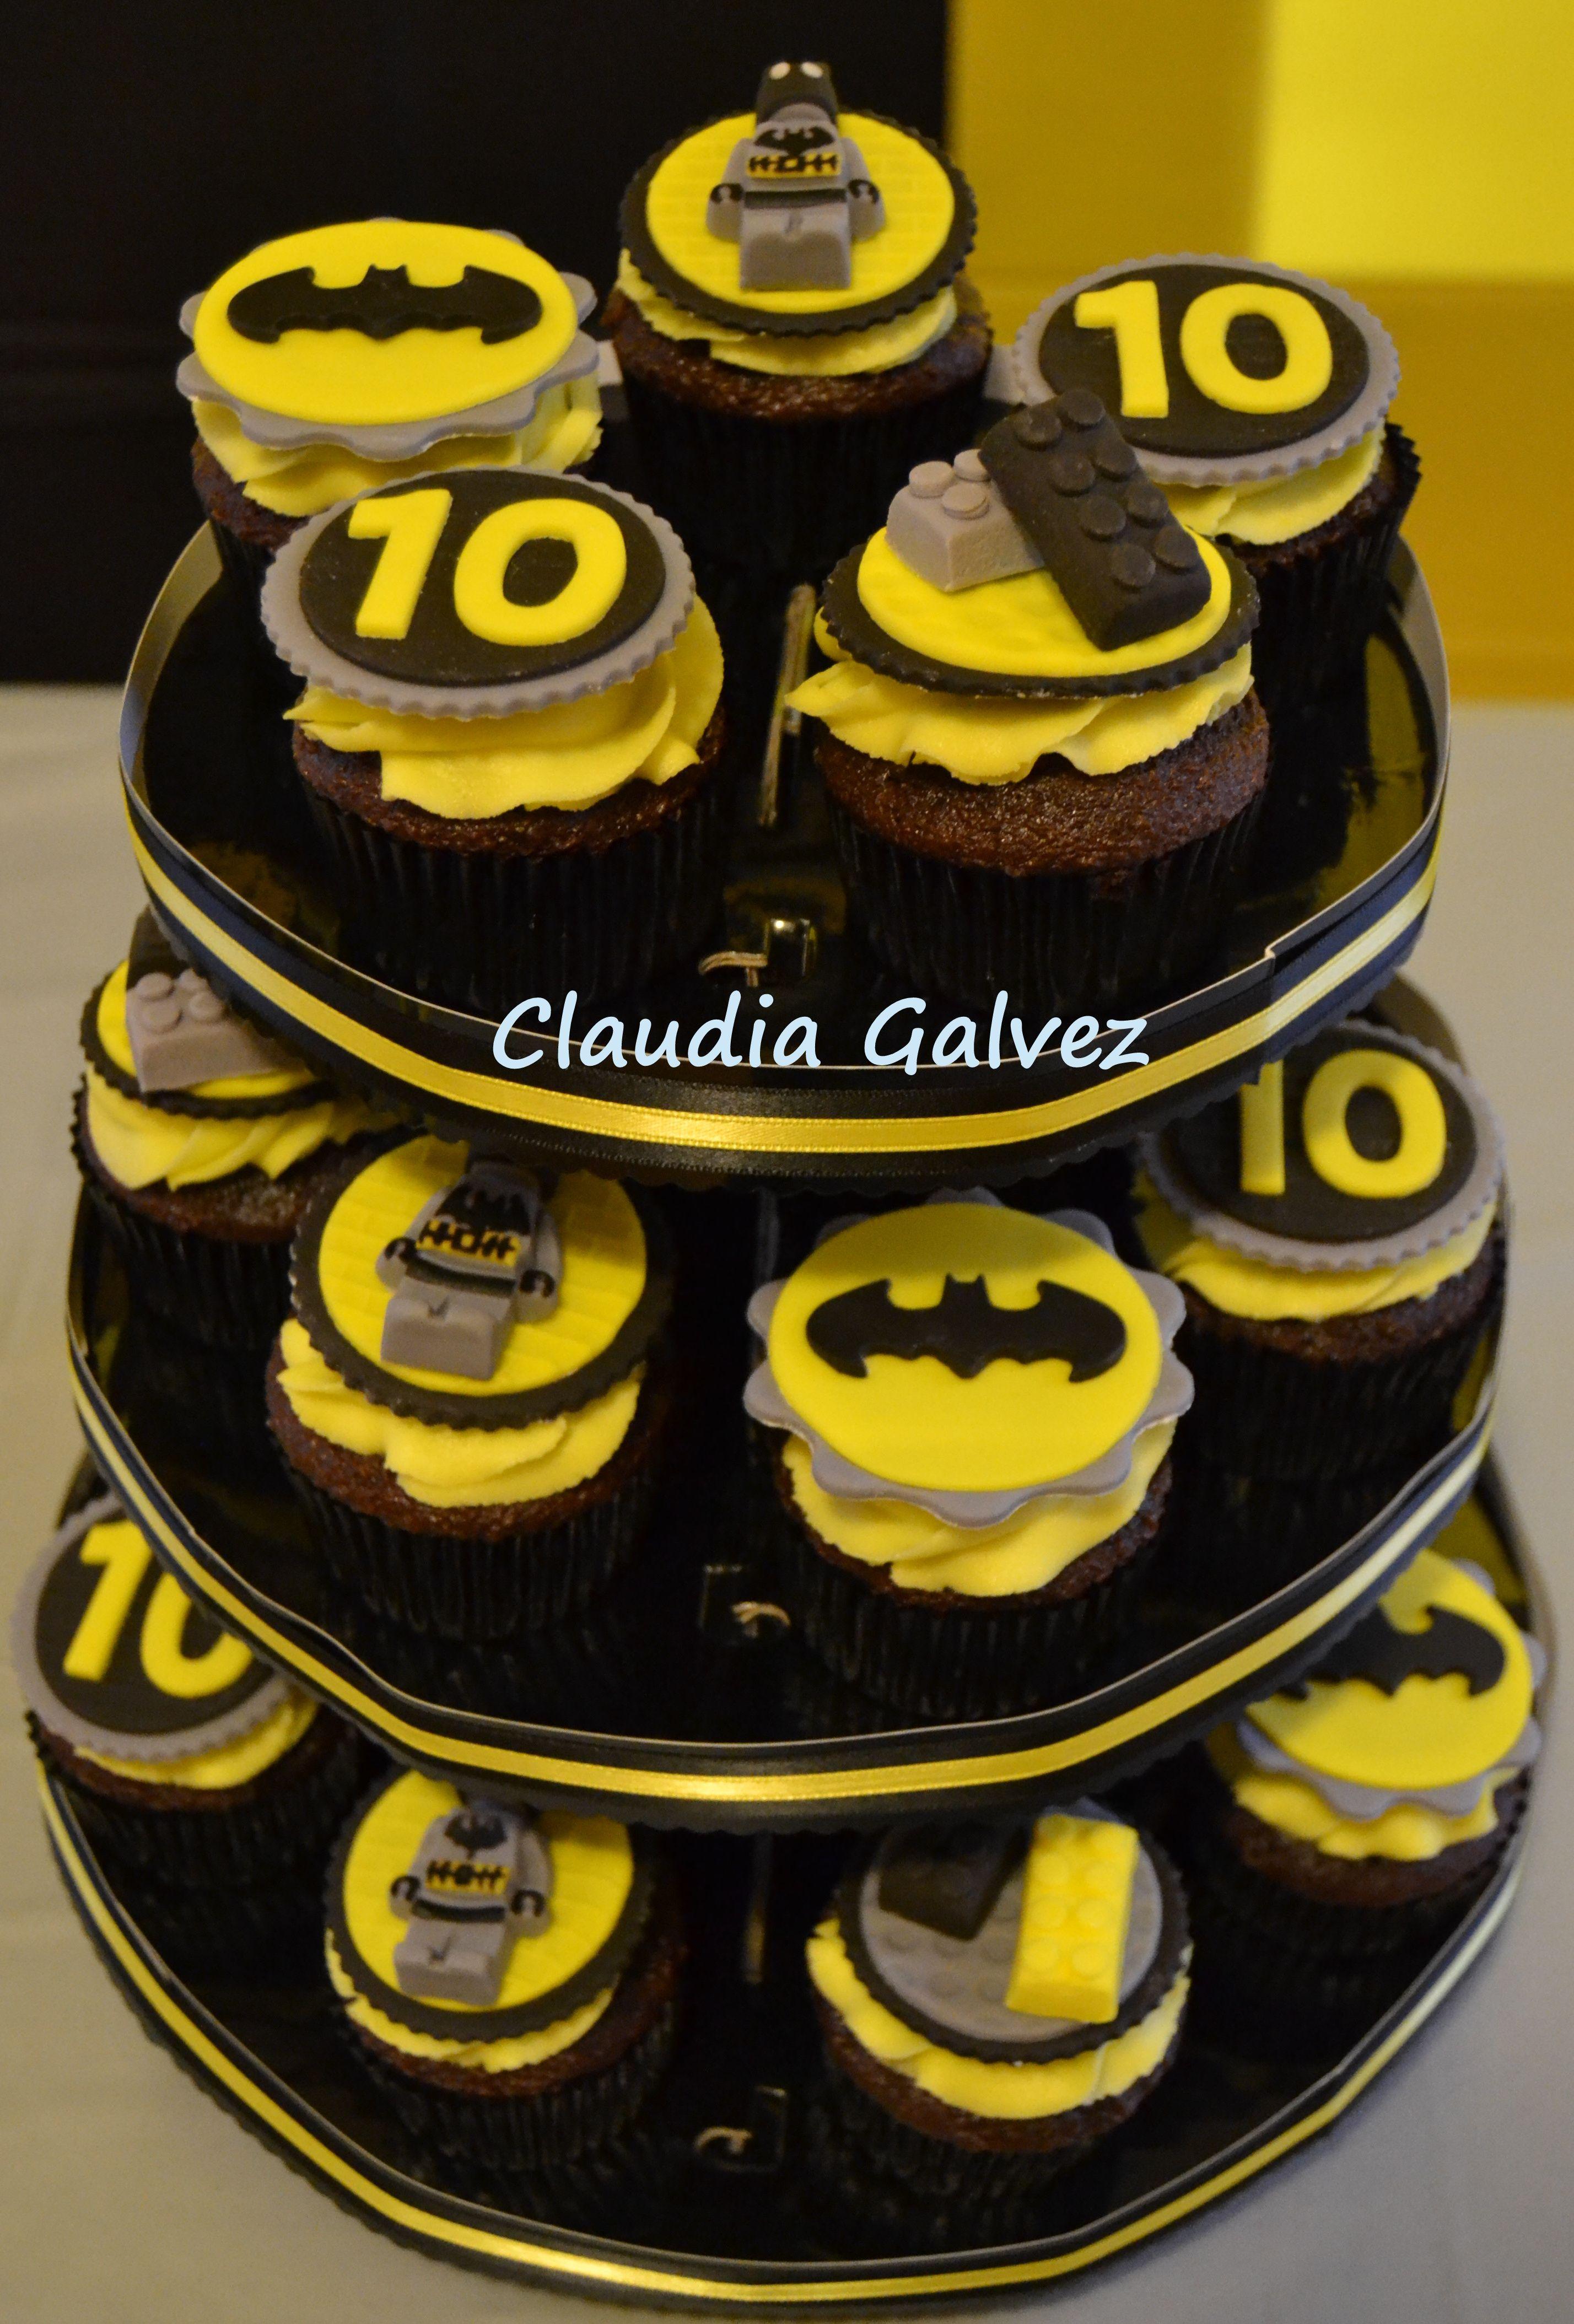 Lego Batman Cupcakes My Sons Birthday Parties Pinterest - Lego batman birthday cake